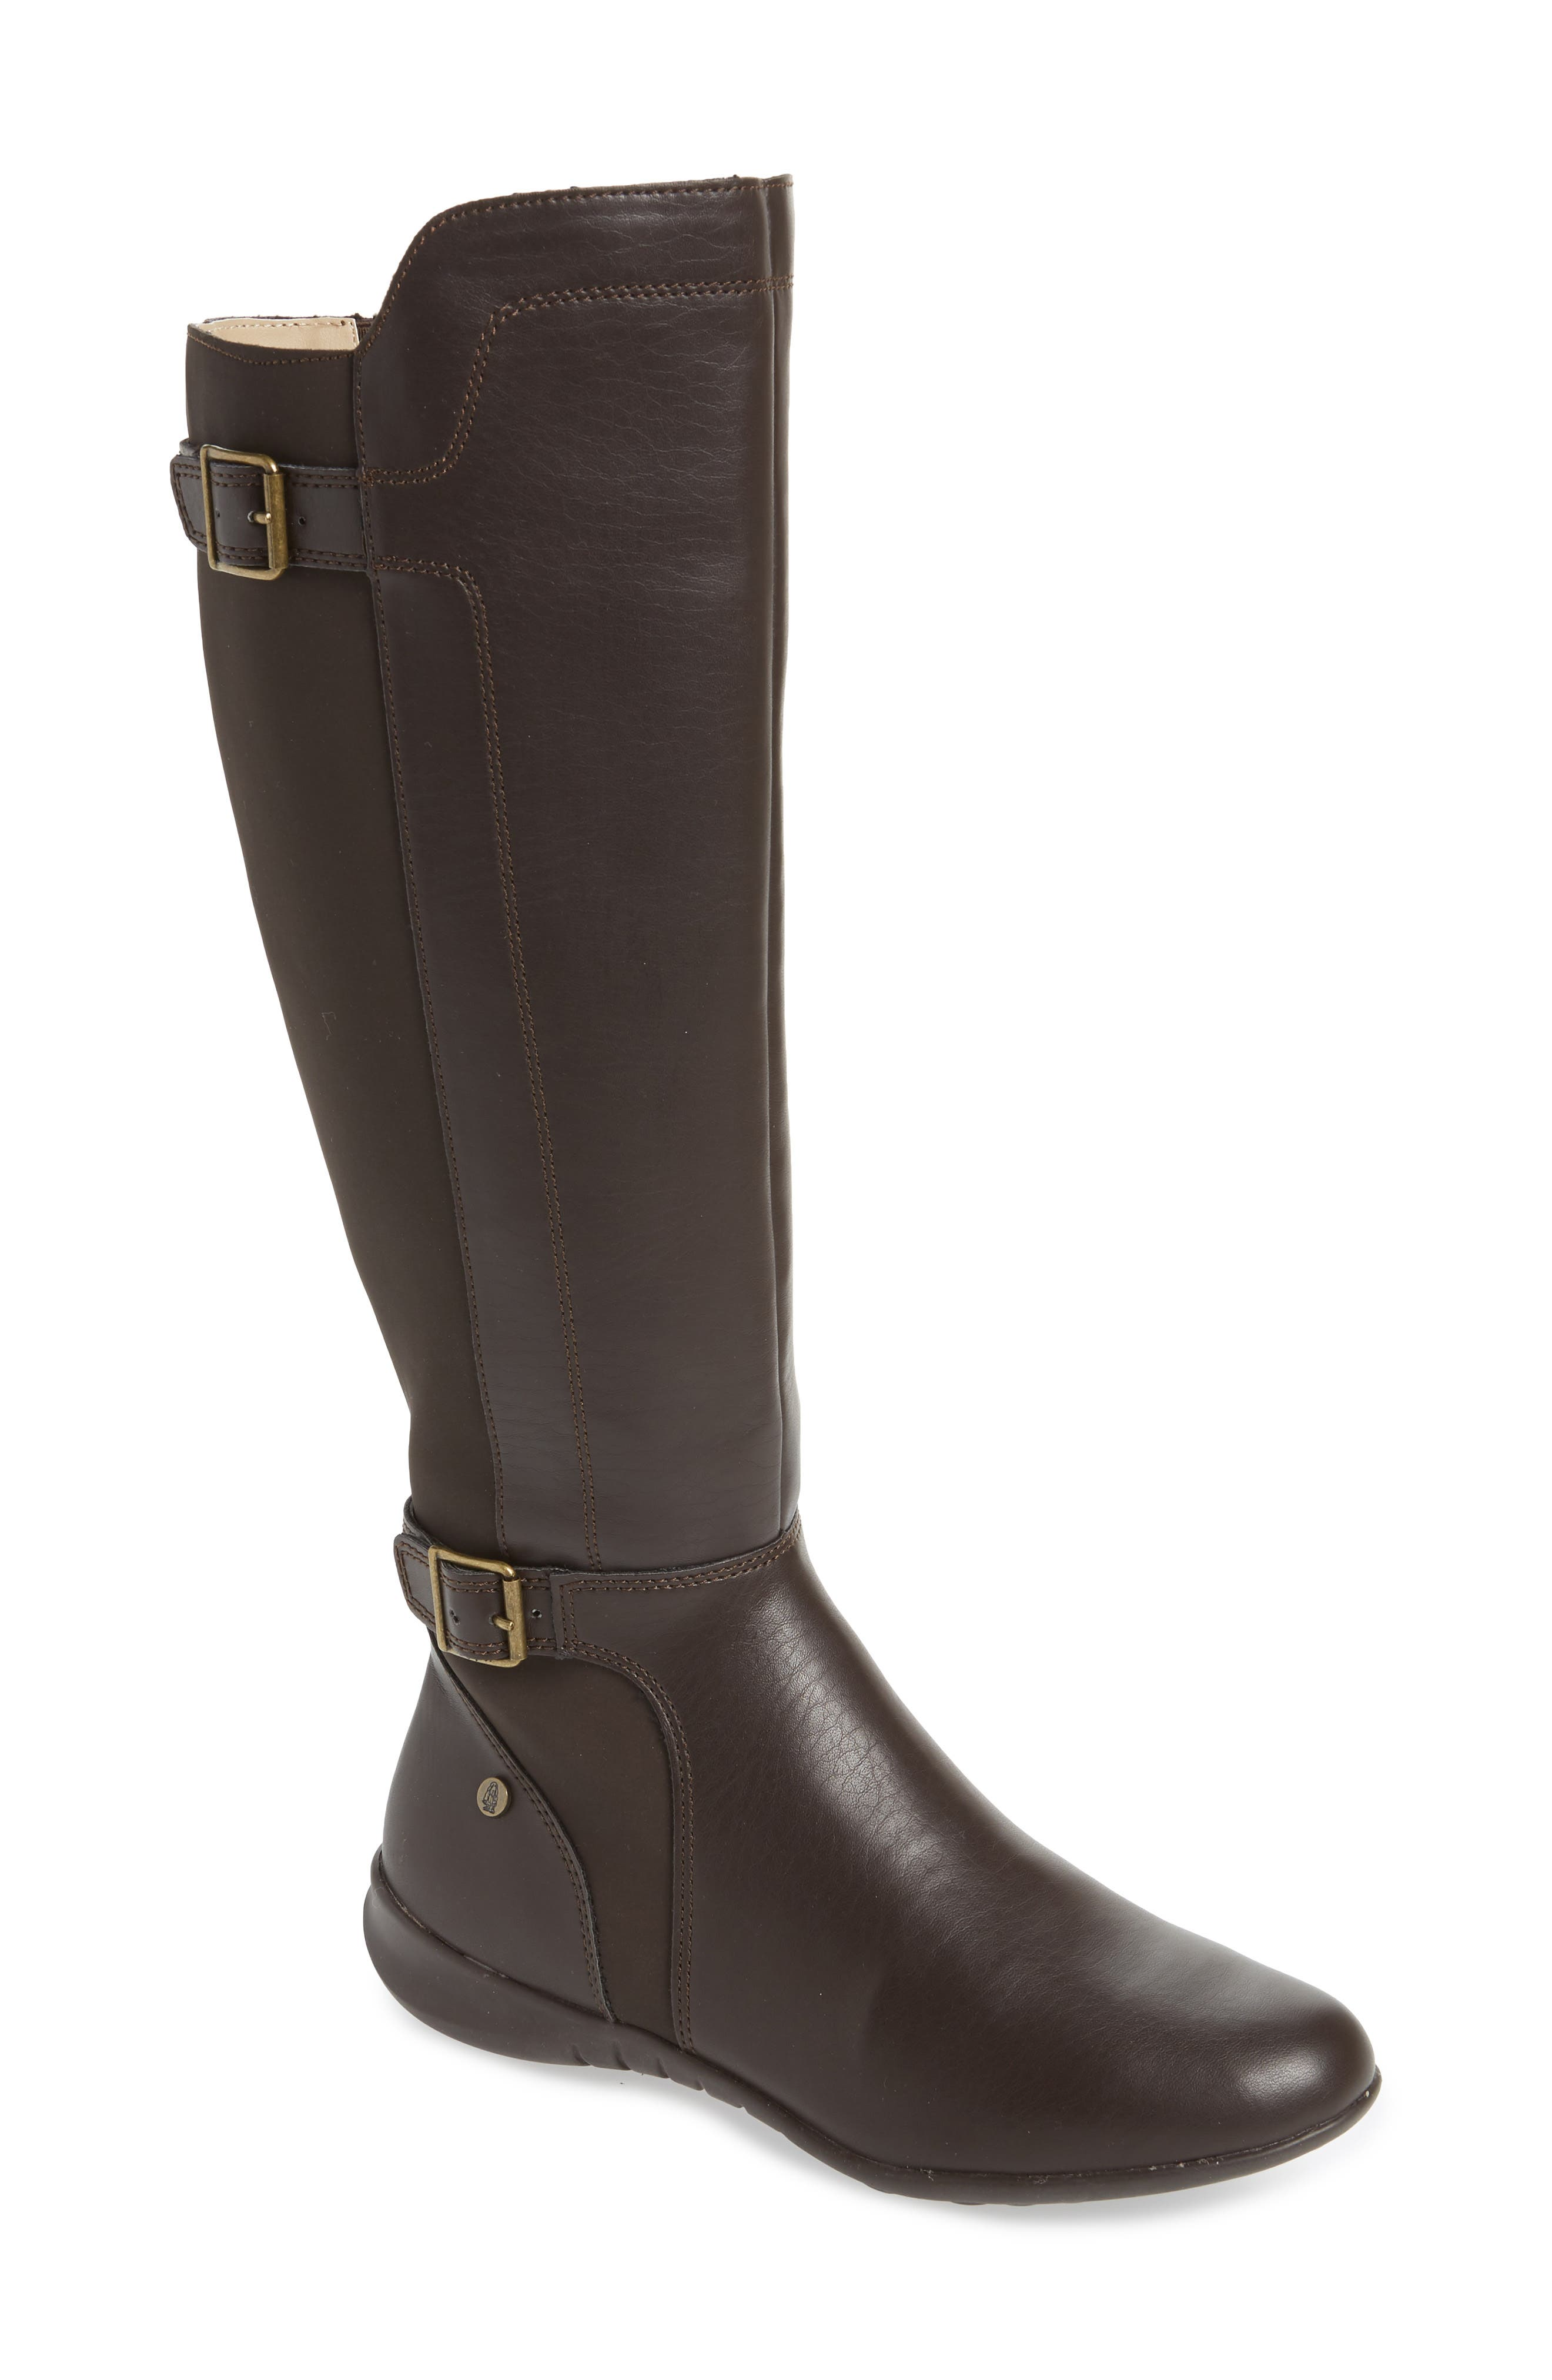 Hush Puppies Bria Knee High Boot- Brown